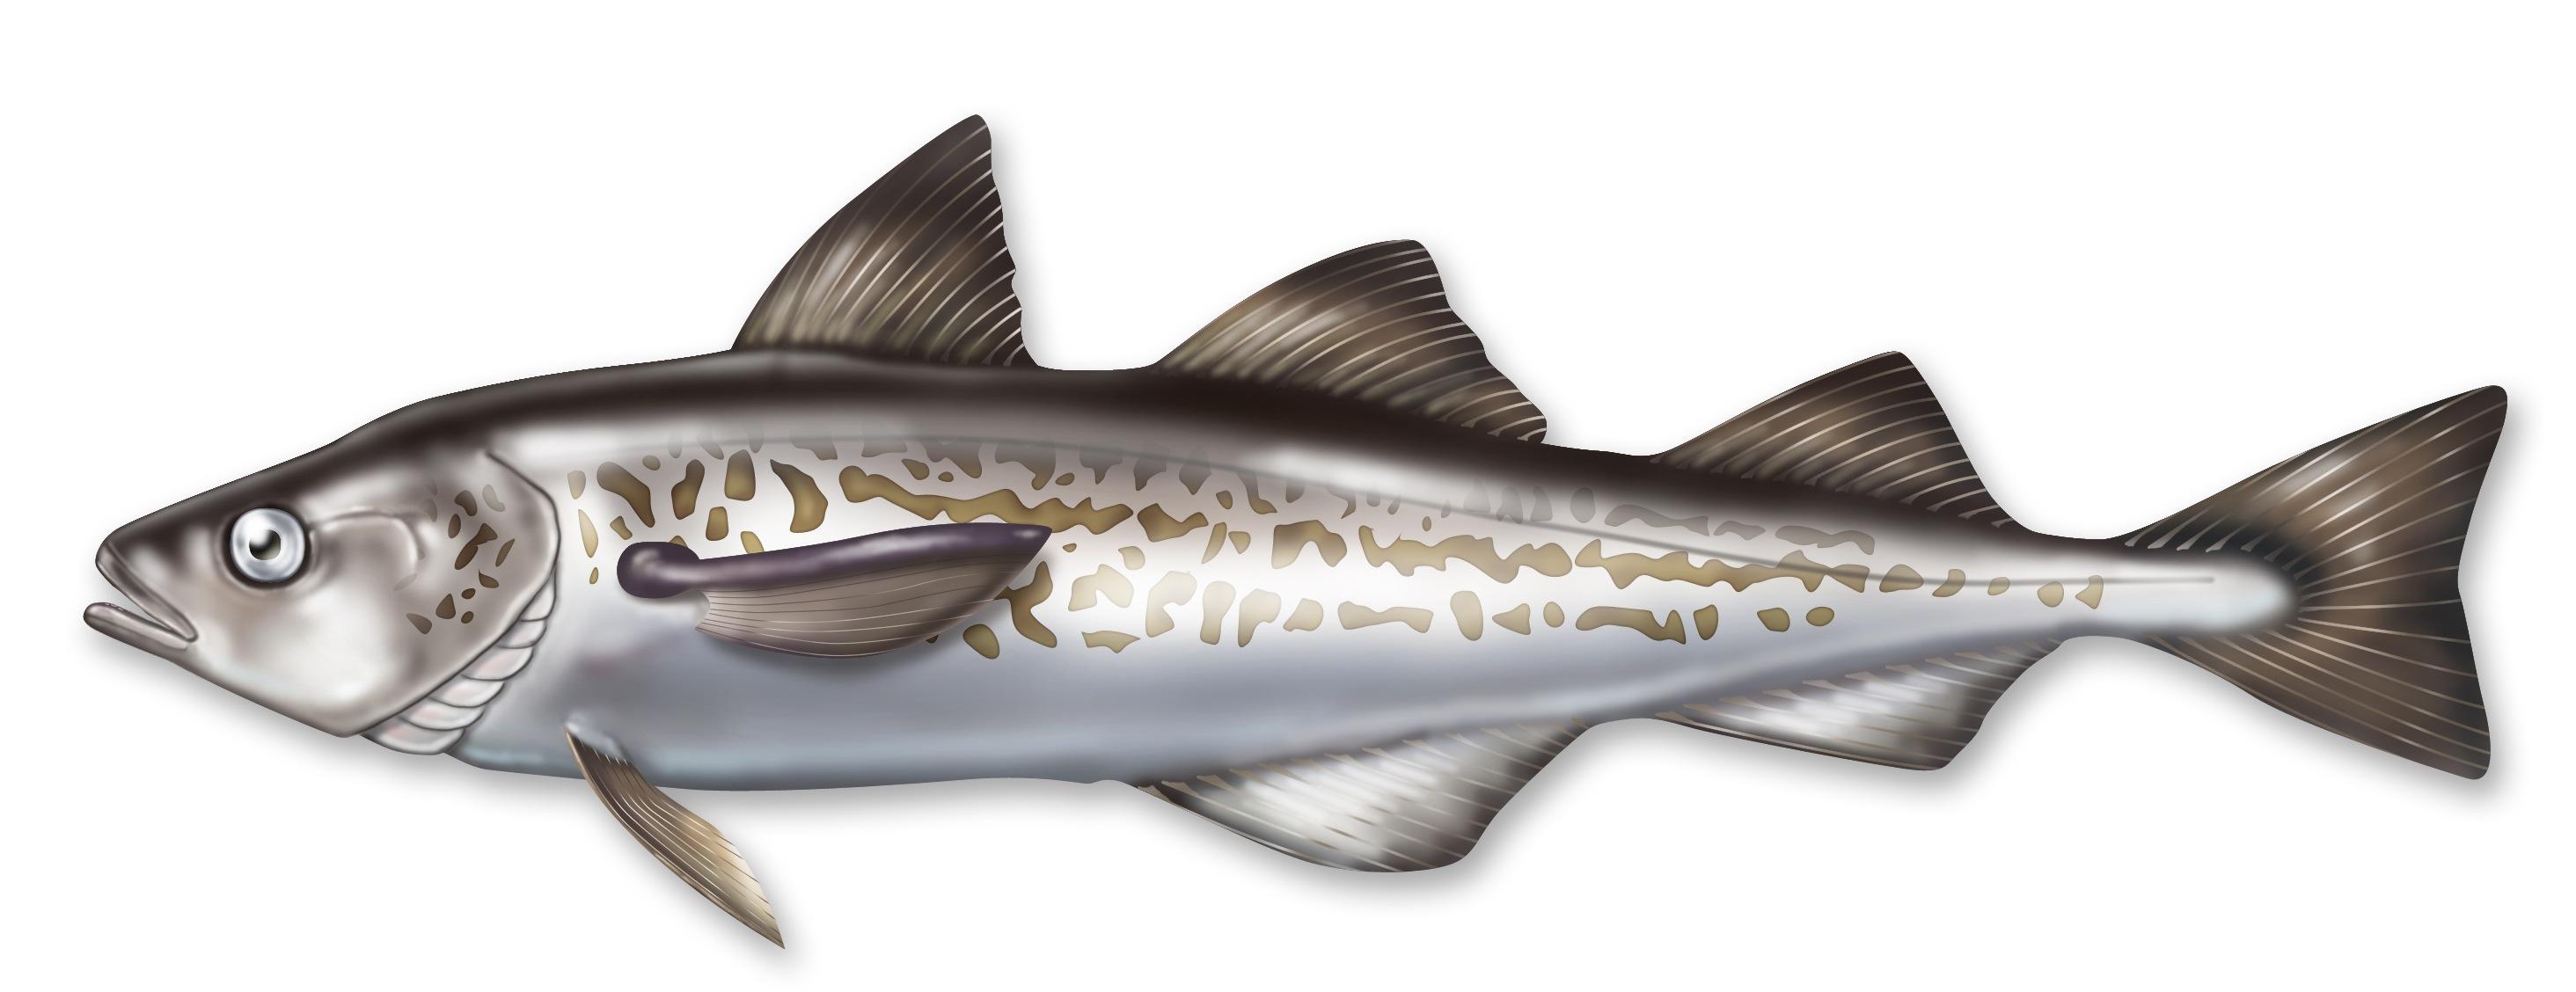 Fish - Pollock